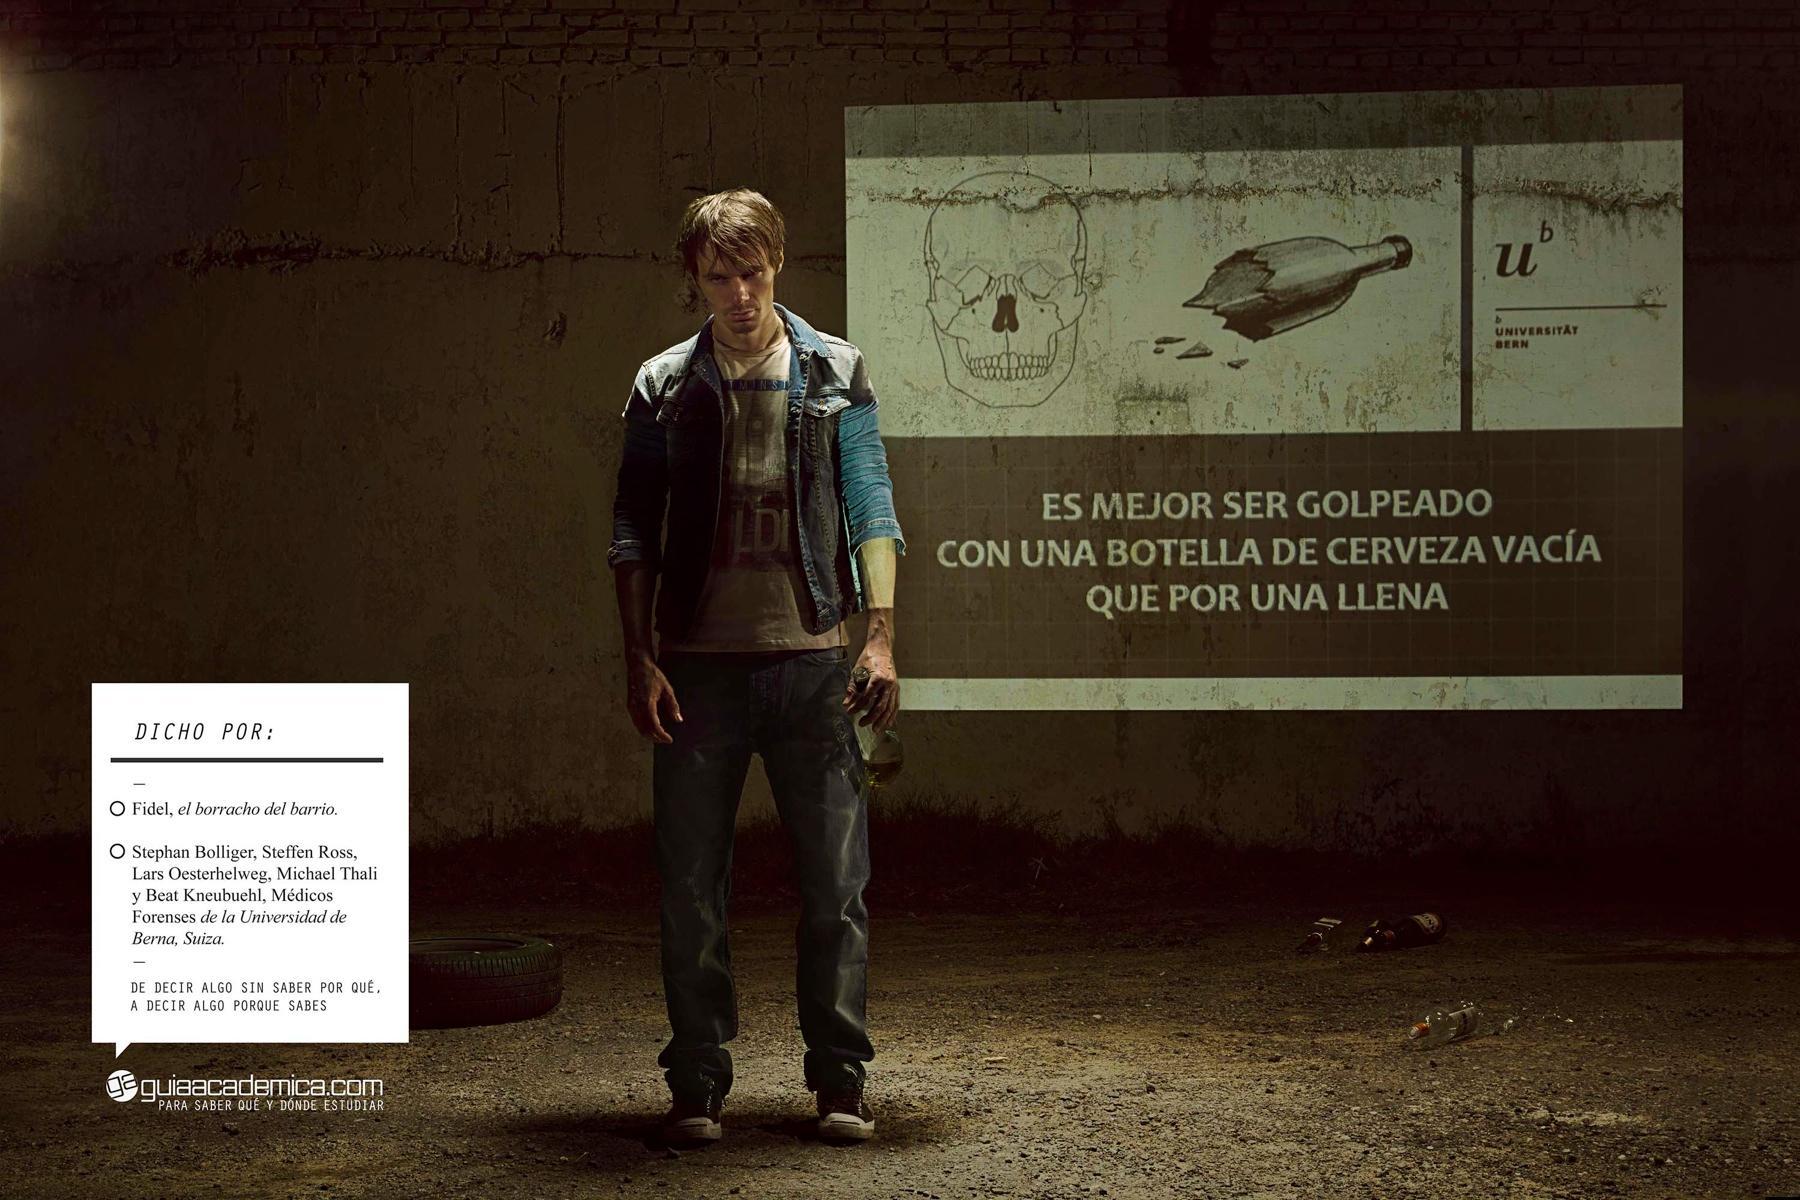 Guia Academica Print Ad -  Drunk